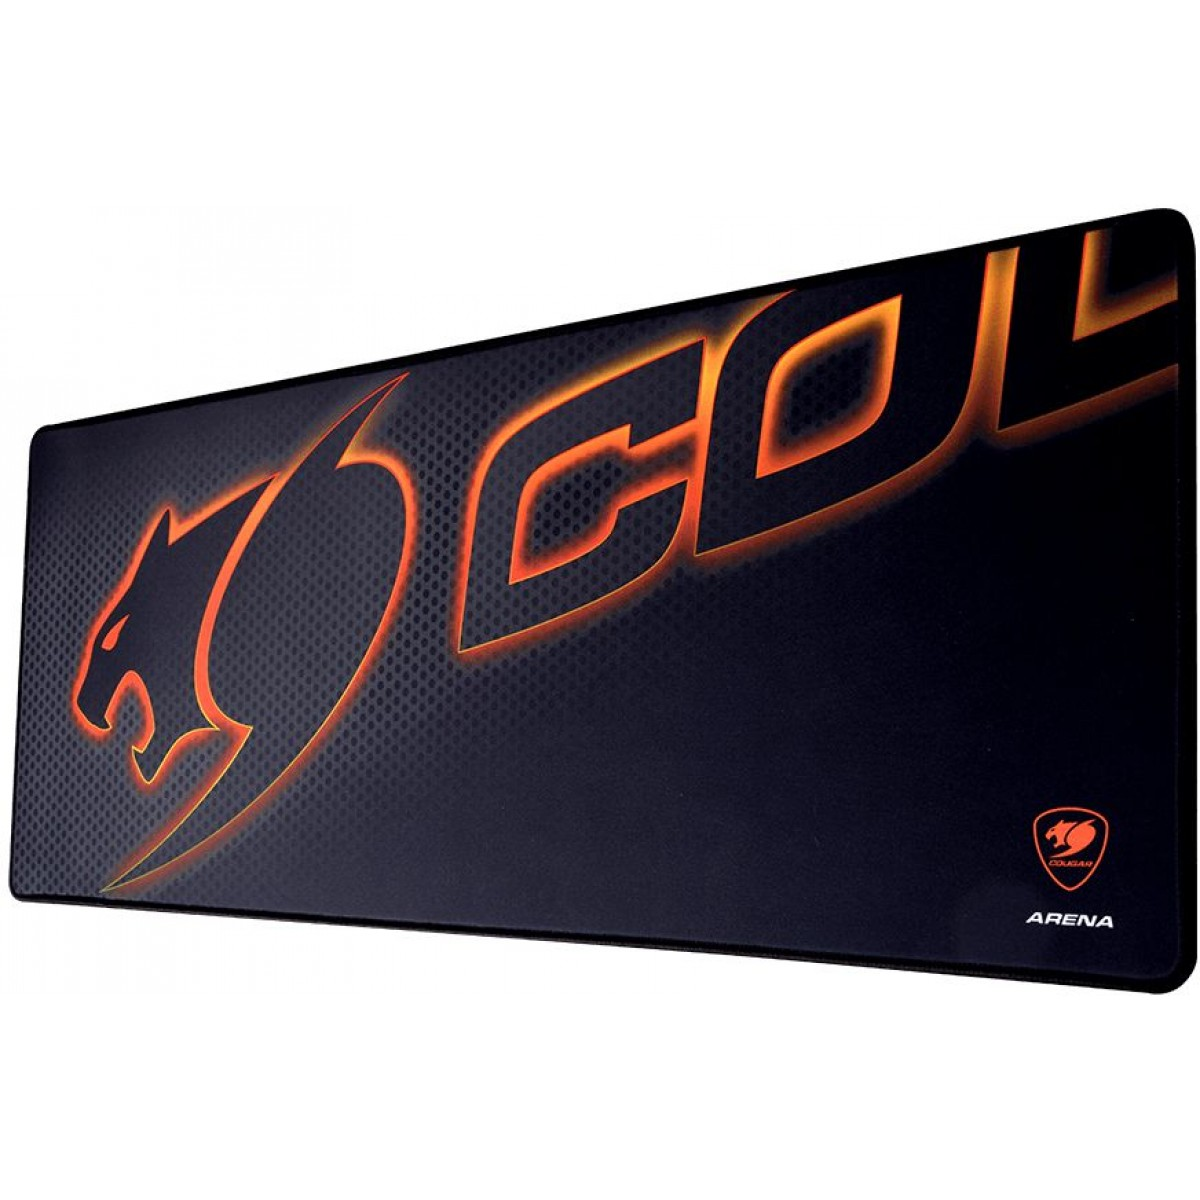 Mousepad Gamer Cougar Arena Black, Extra Grande, Black